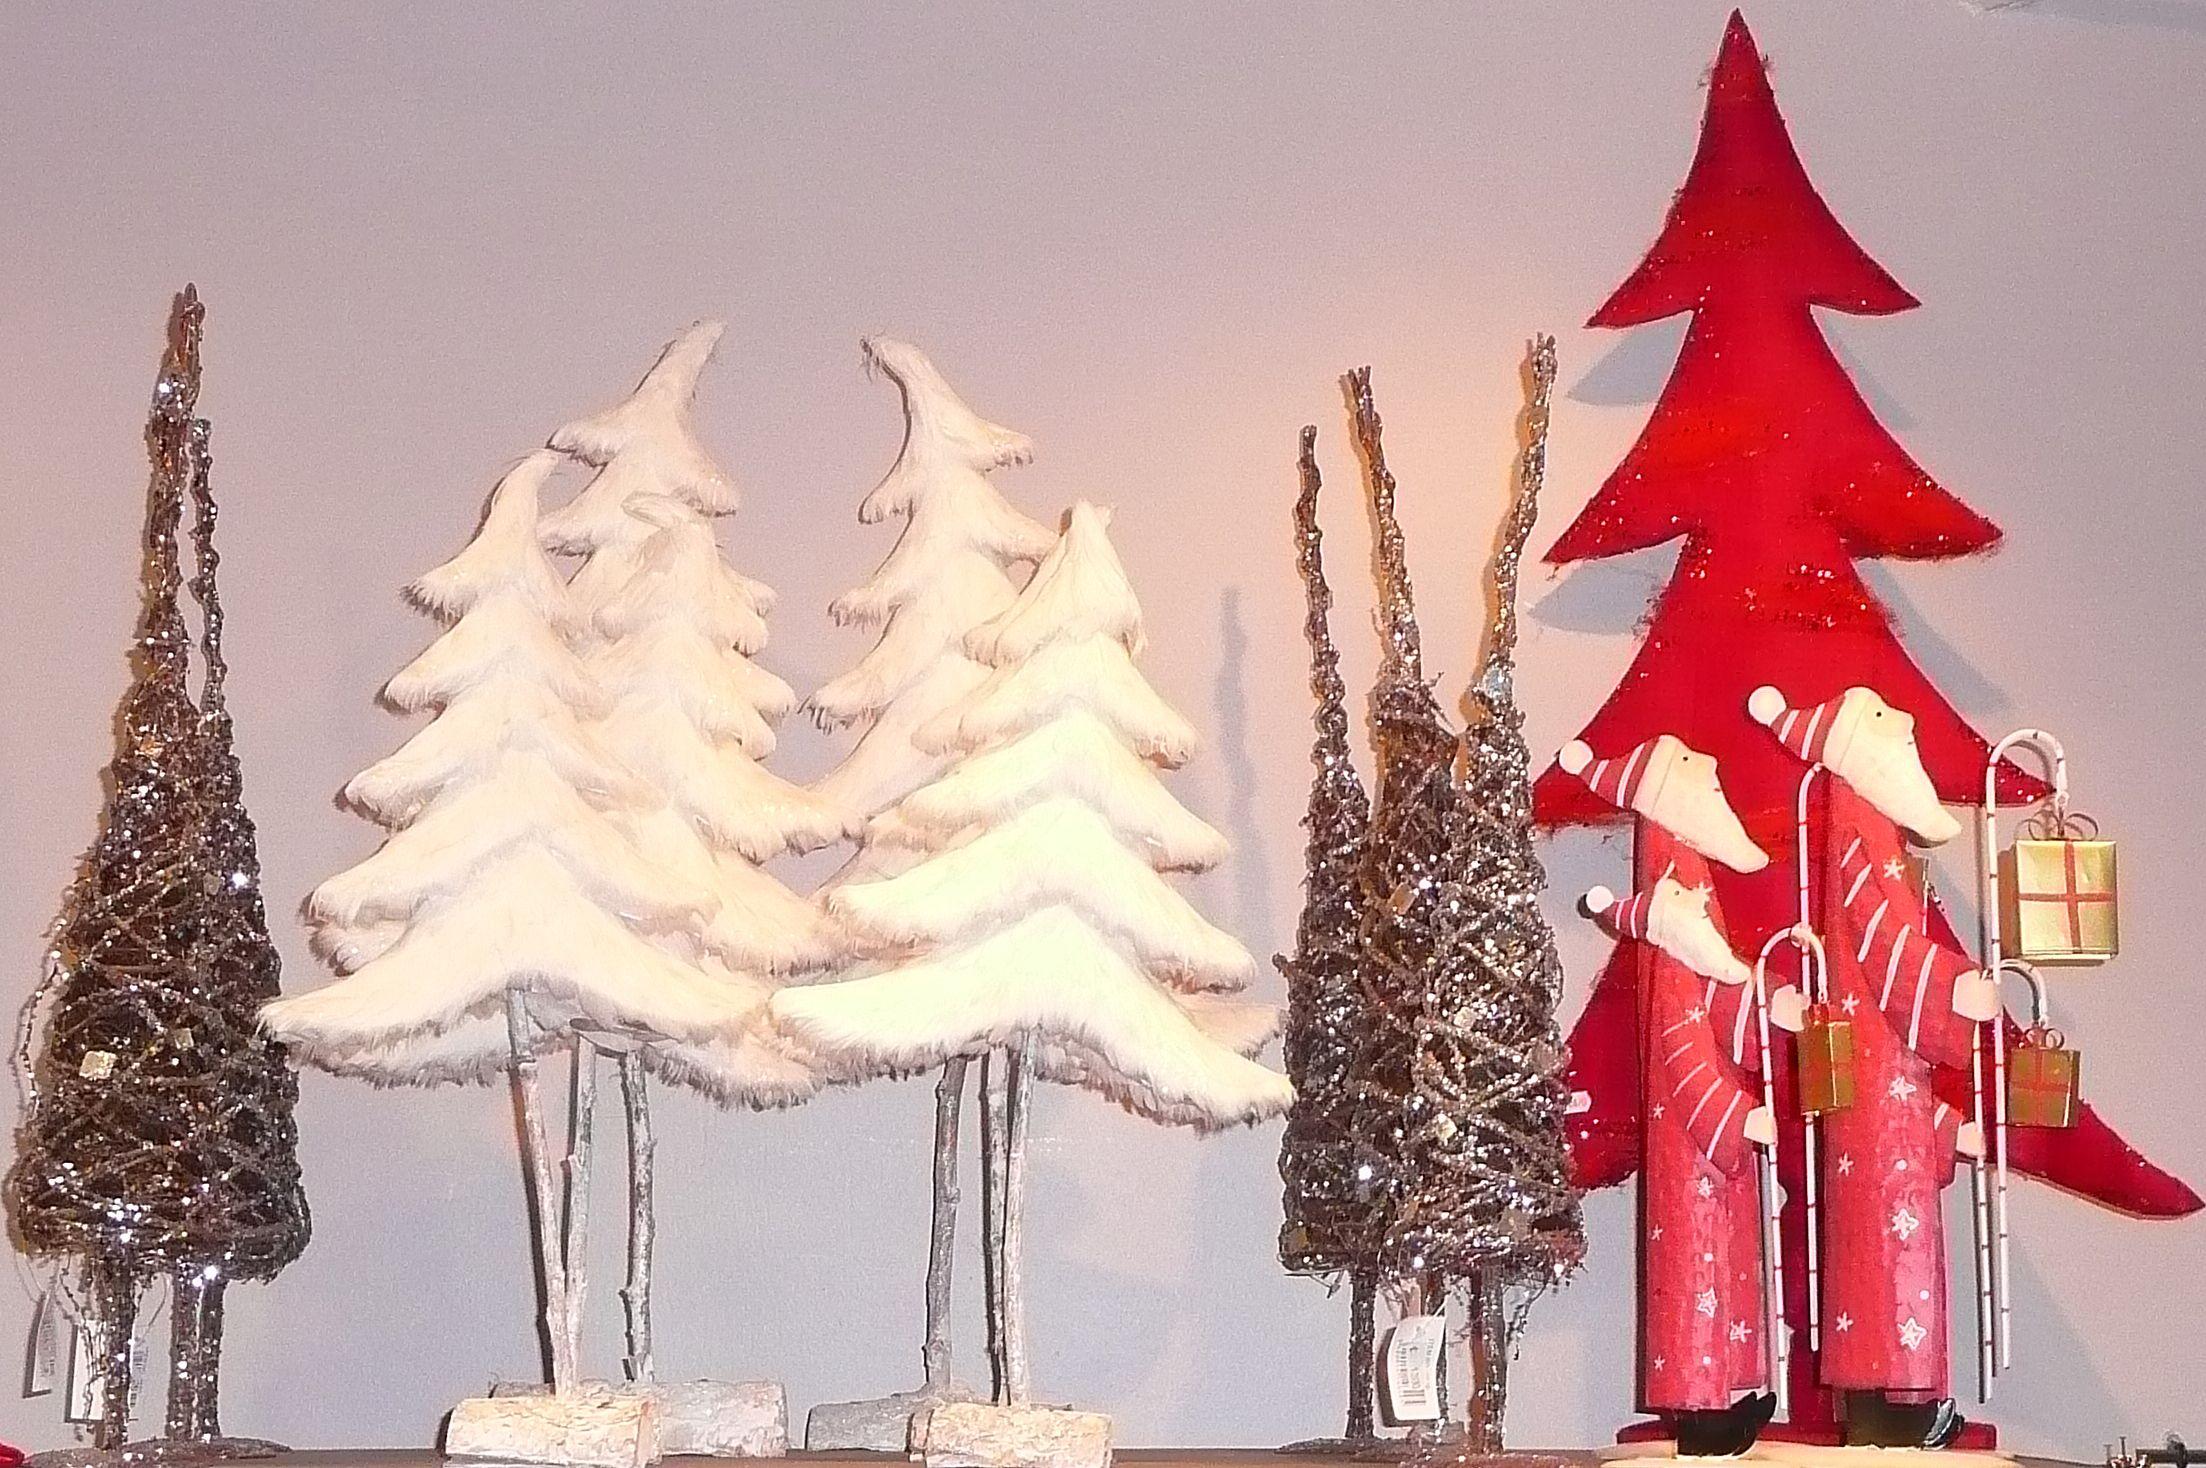 Arbres.  Noël - Christmas - Jadore Noël!  Pinterest